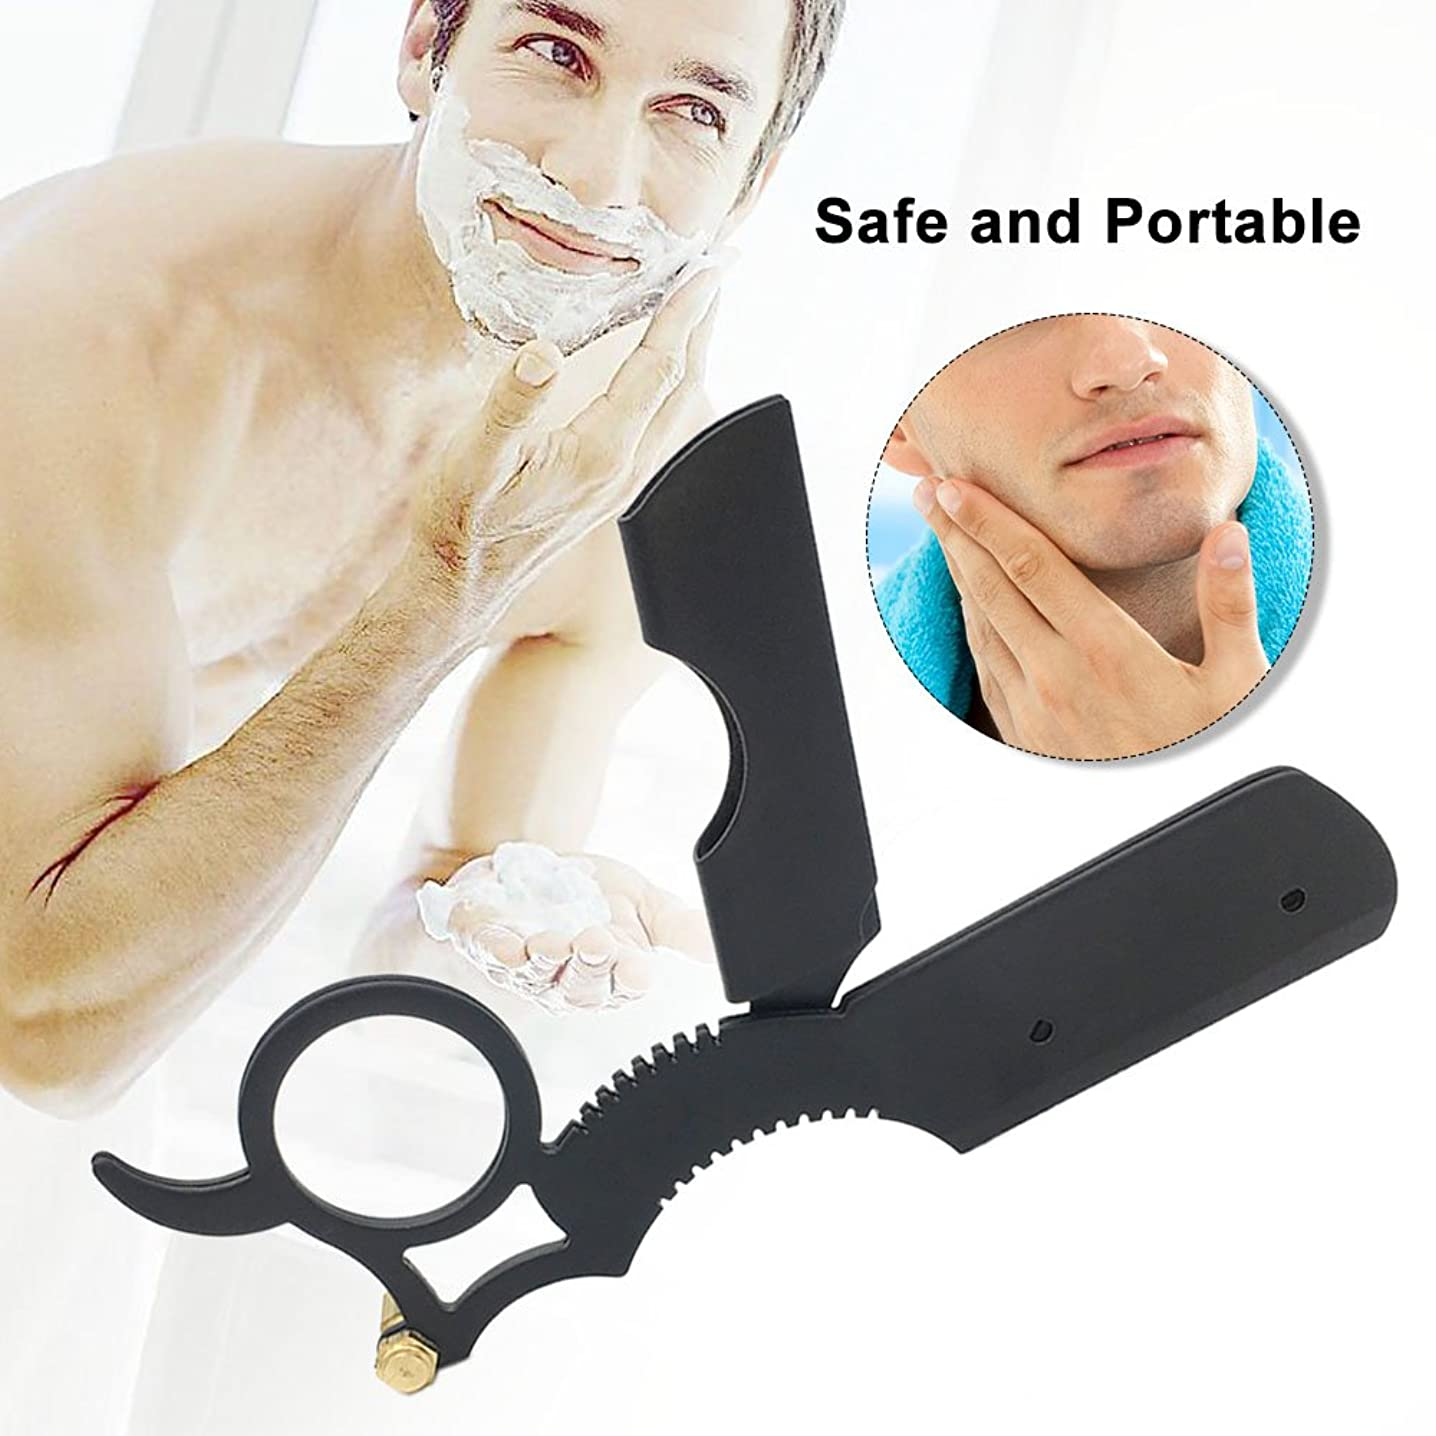 Klaxiaz - 高品質プロフェッショナルストレートエッジトラベルホーム供給のための理髪店カミソリステンレス鋼の刃メンズシェーバー髪アンティークシェービングツール